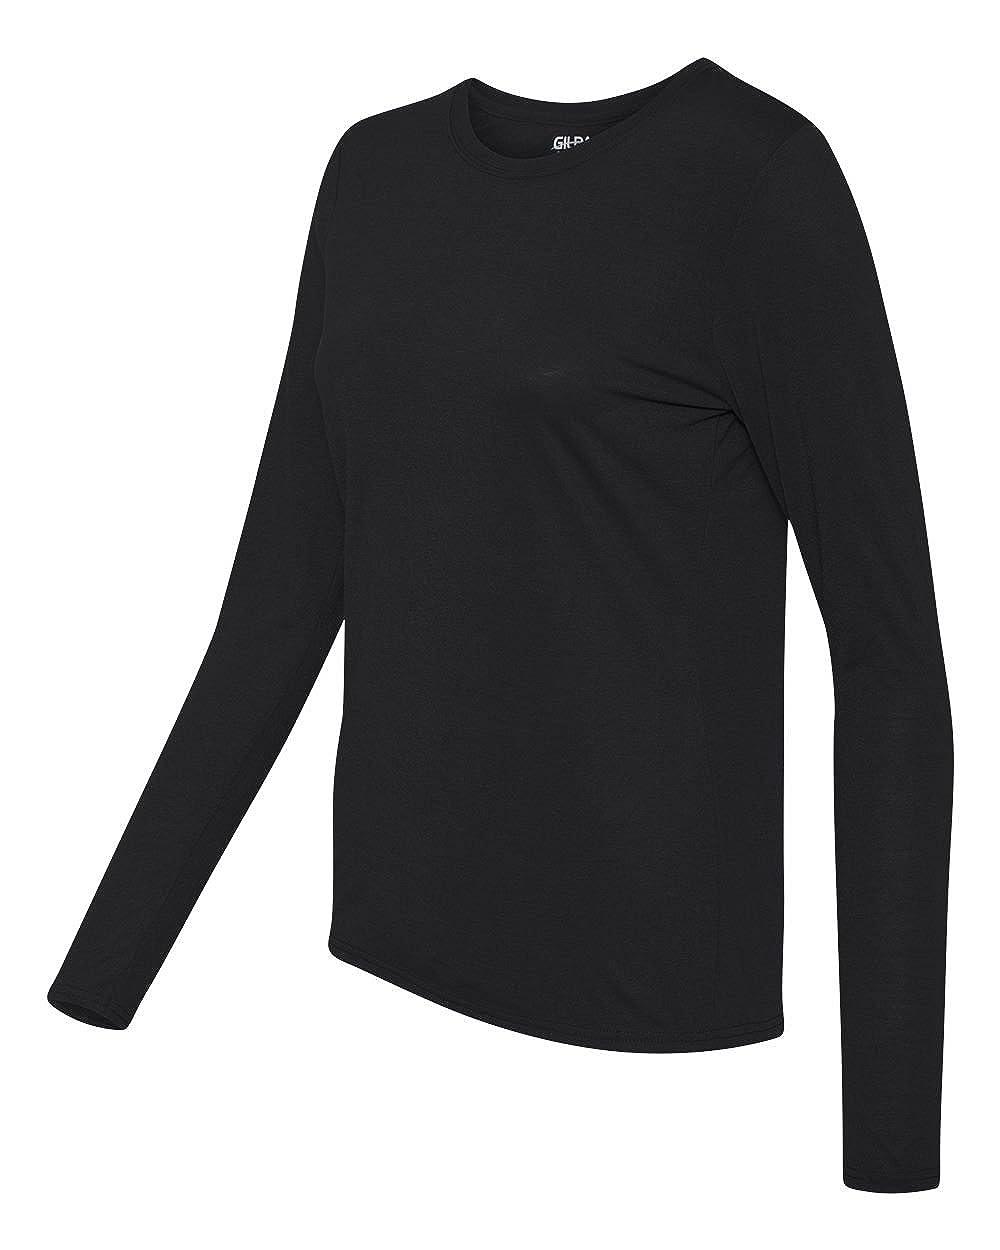 d4bcc8b155cf Gildan 42400L Ladies core performance long sleeve t-shirt at Amazon Women s  Clothing store  Athletic T Shirts